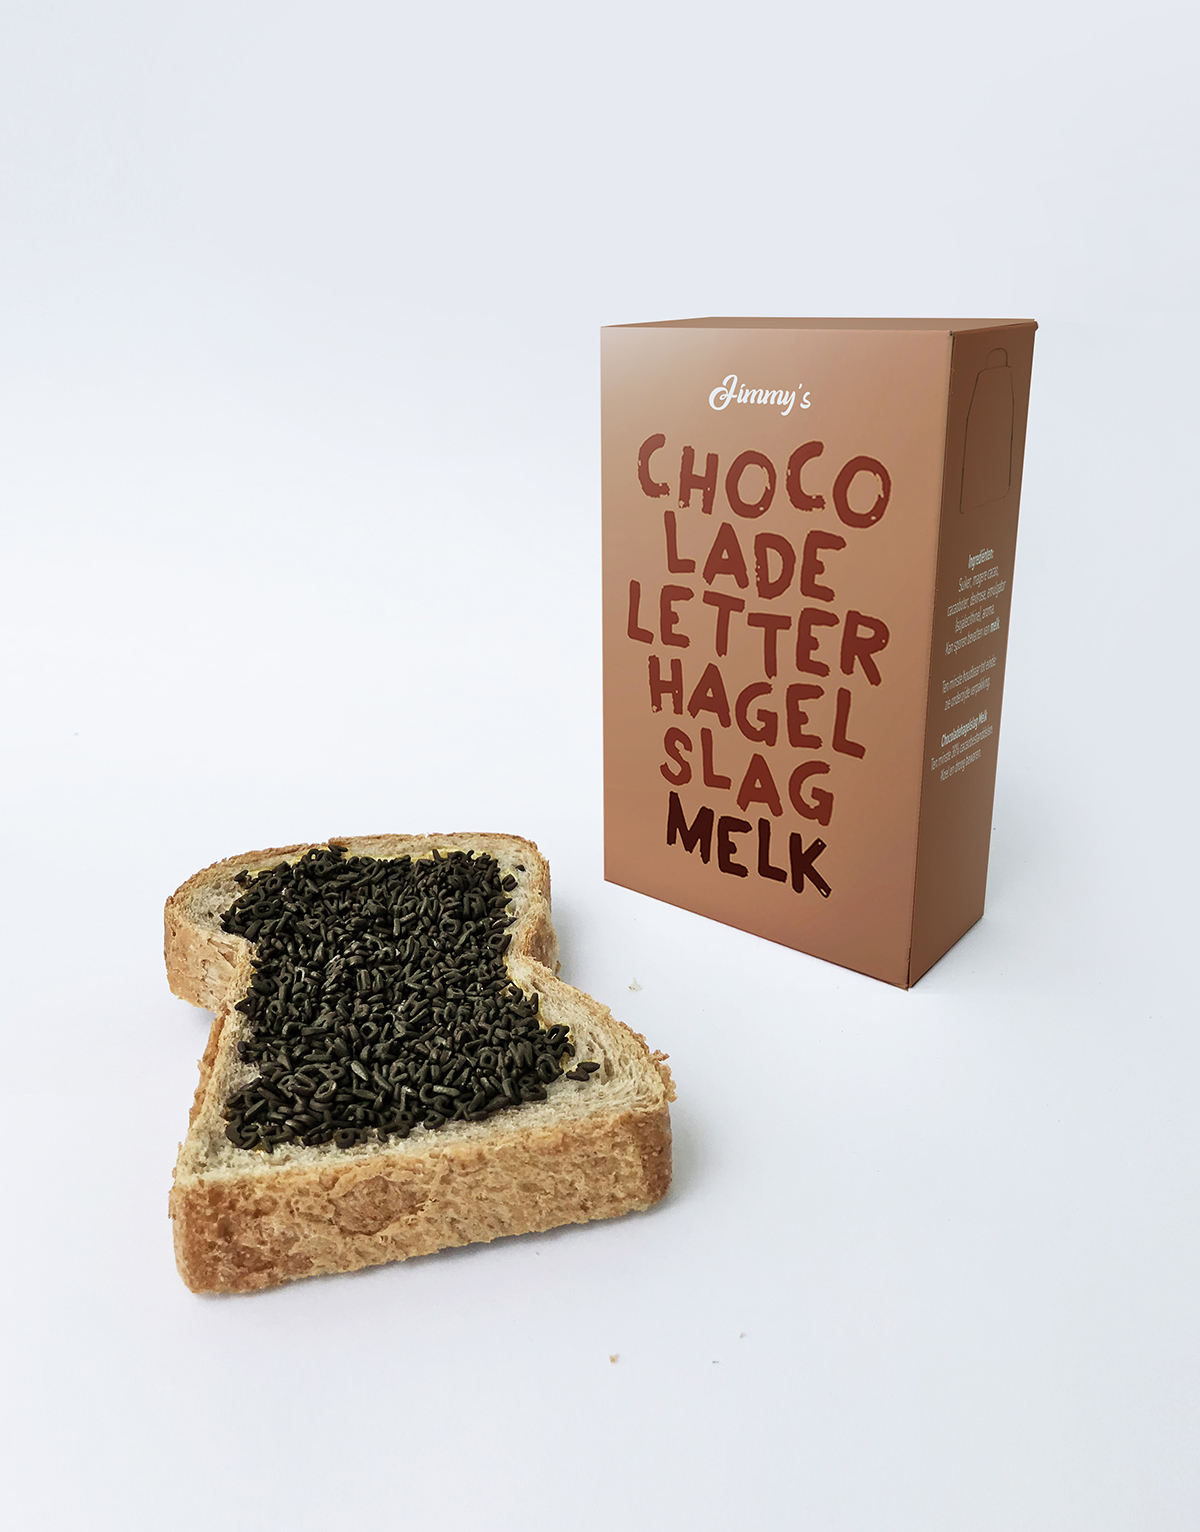 Chocoladeletterhagelslag